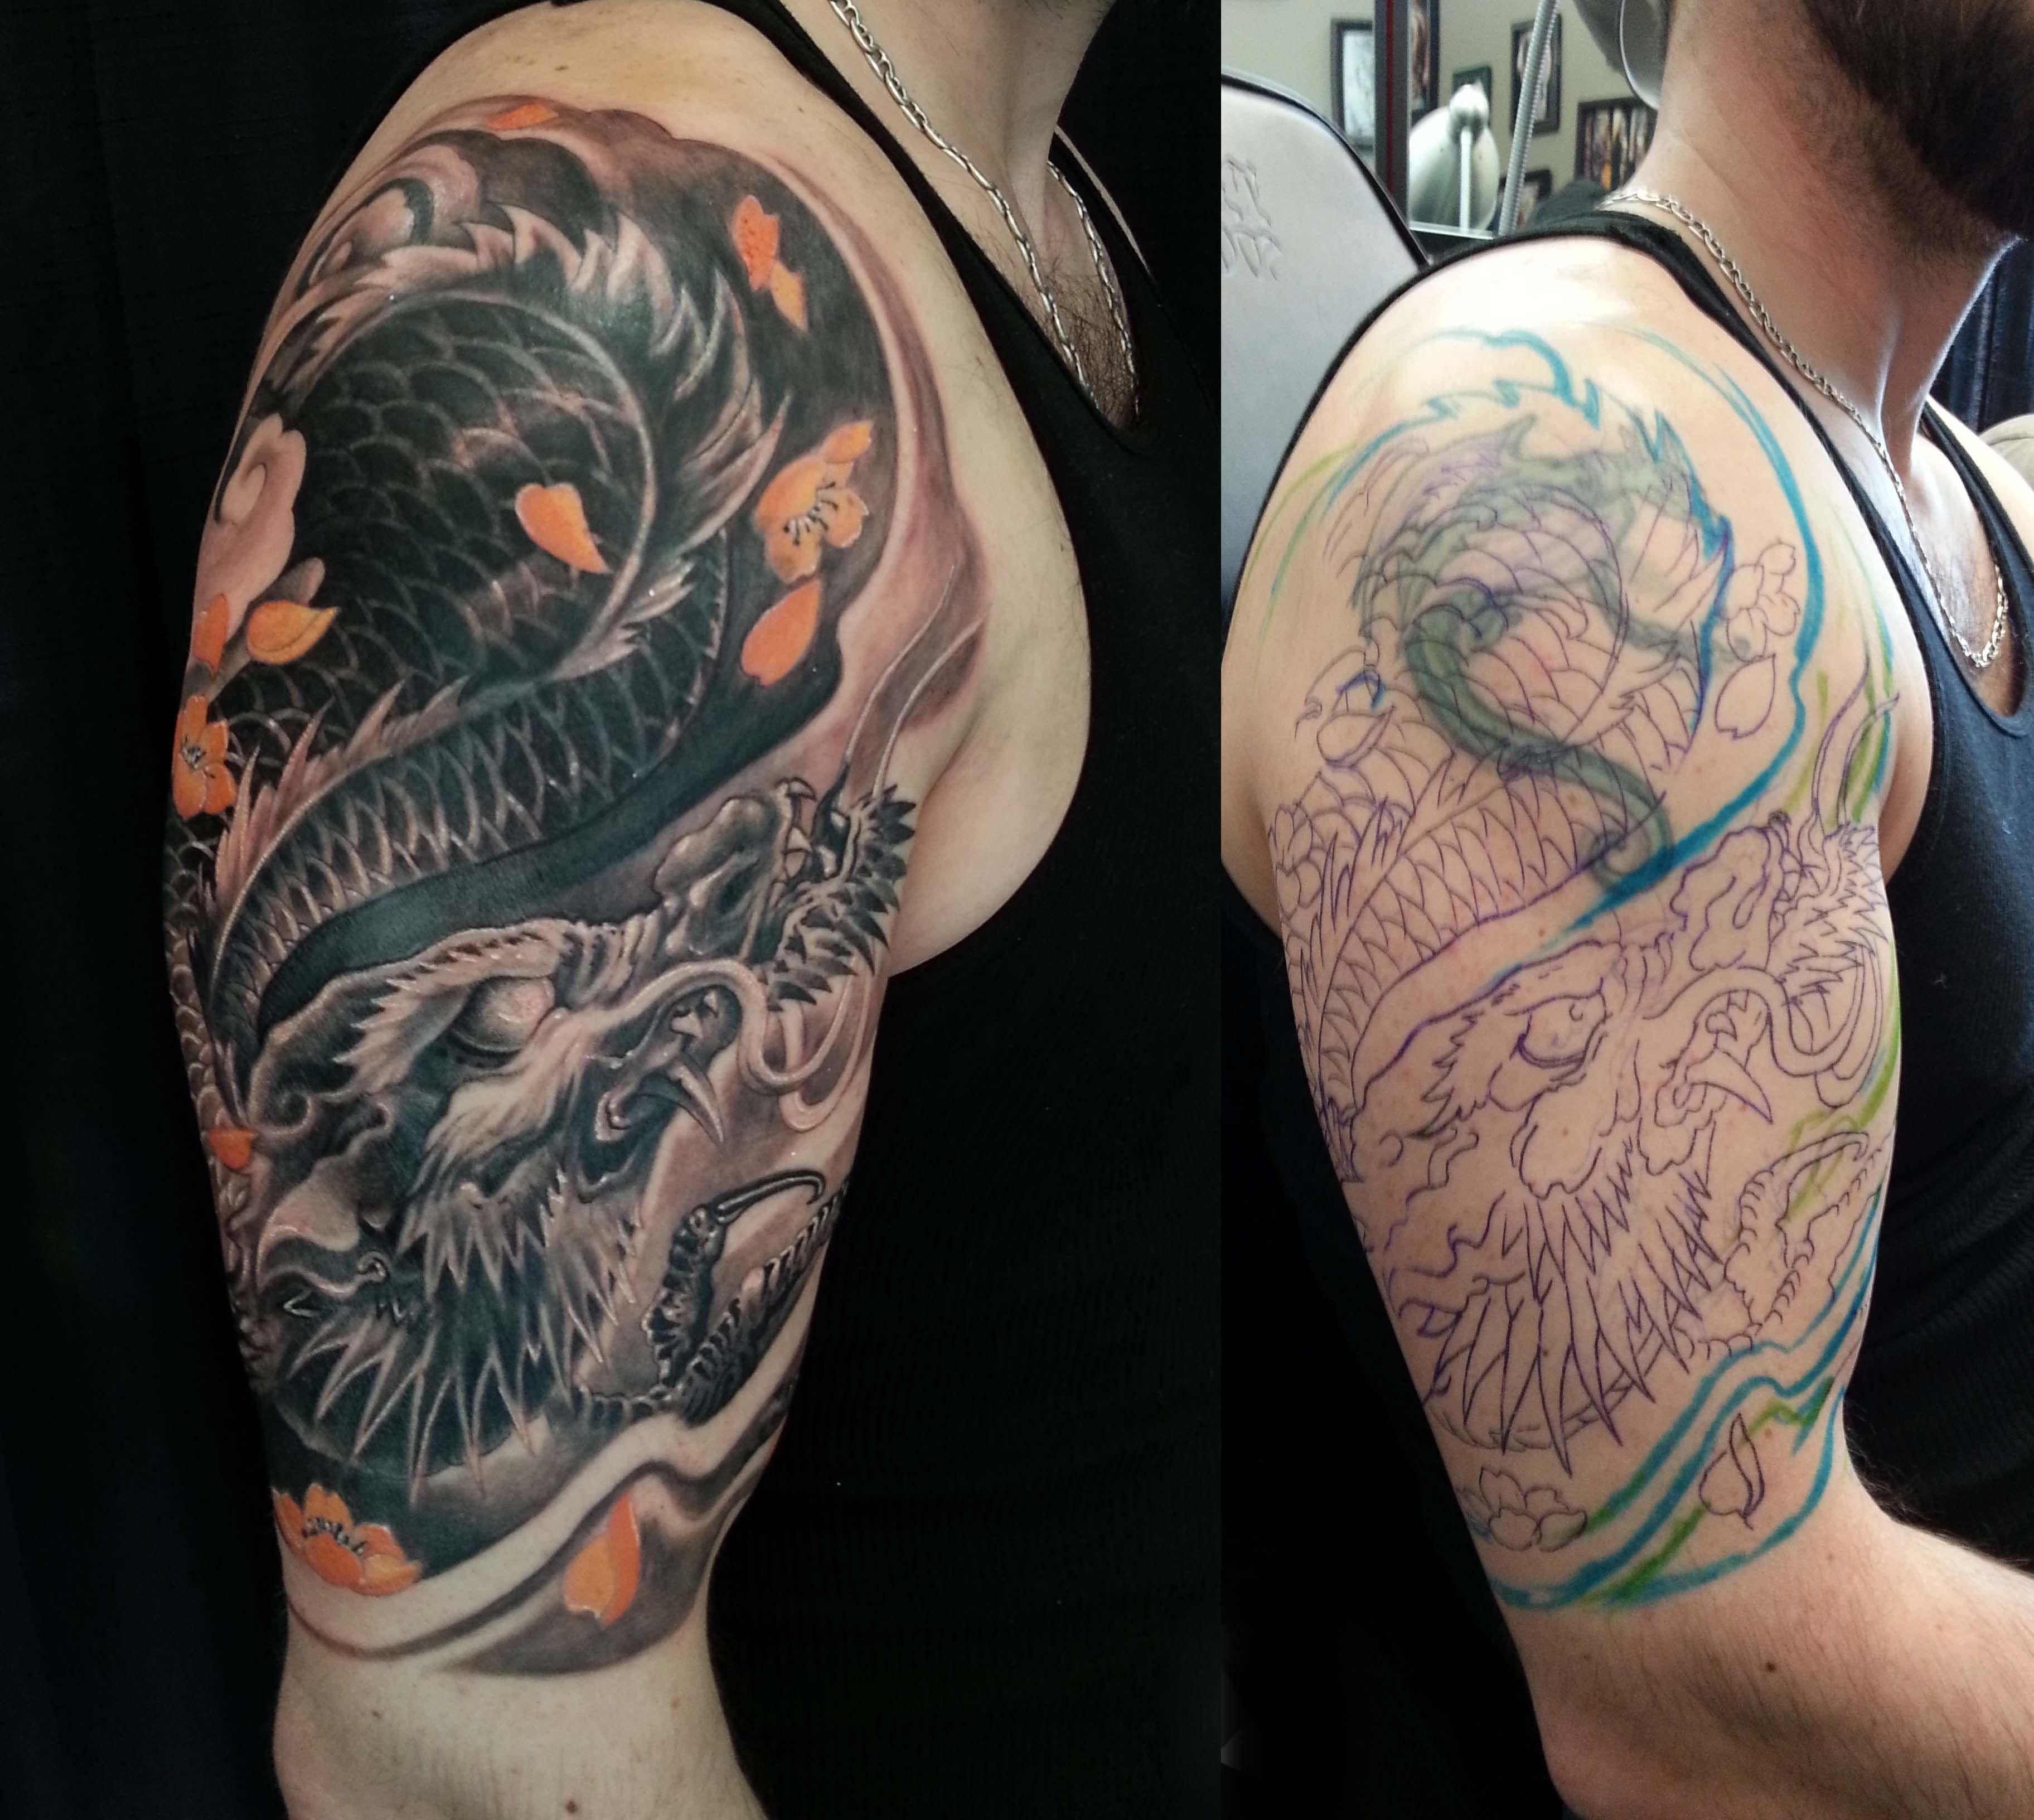 Tattoo Sleeve Cover Tattoo cover sleeve, Cover tattoo